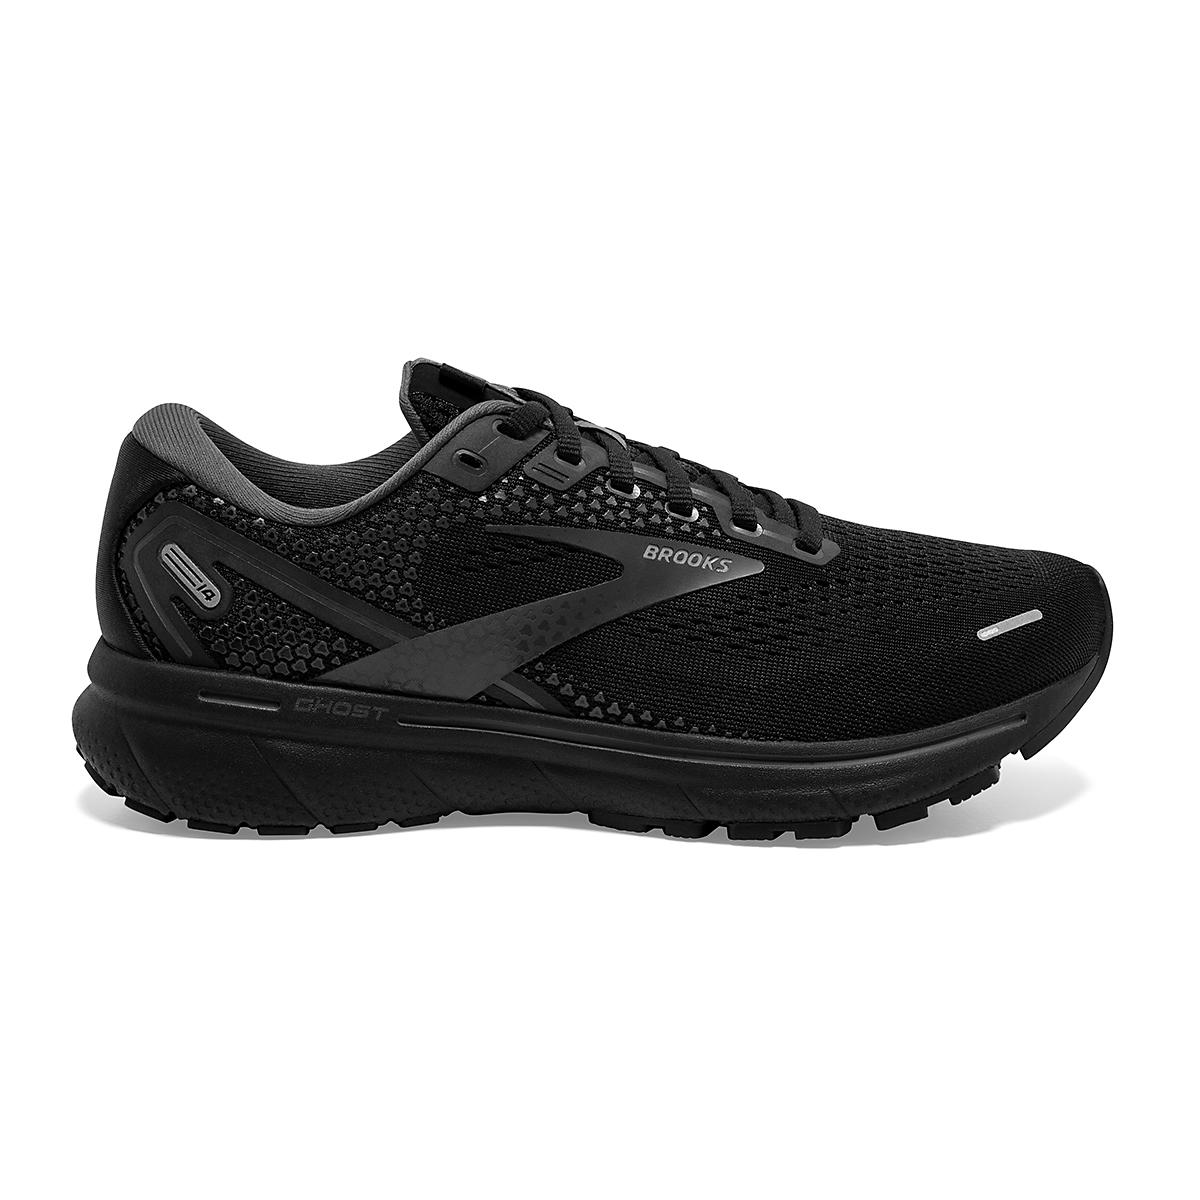 Women's Brooks Ghost 14 Running Shoe - Color: Black/Black/Ebony - Size: 5 - Width: Regular, Black/Black/Ebony, large, image 1